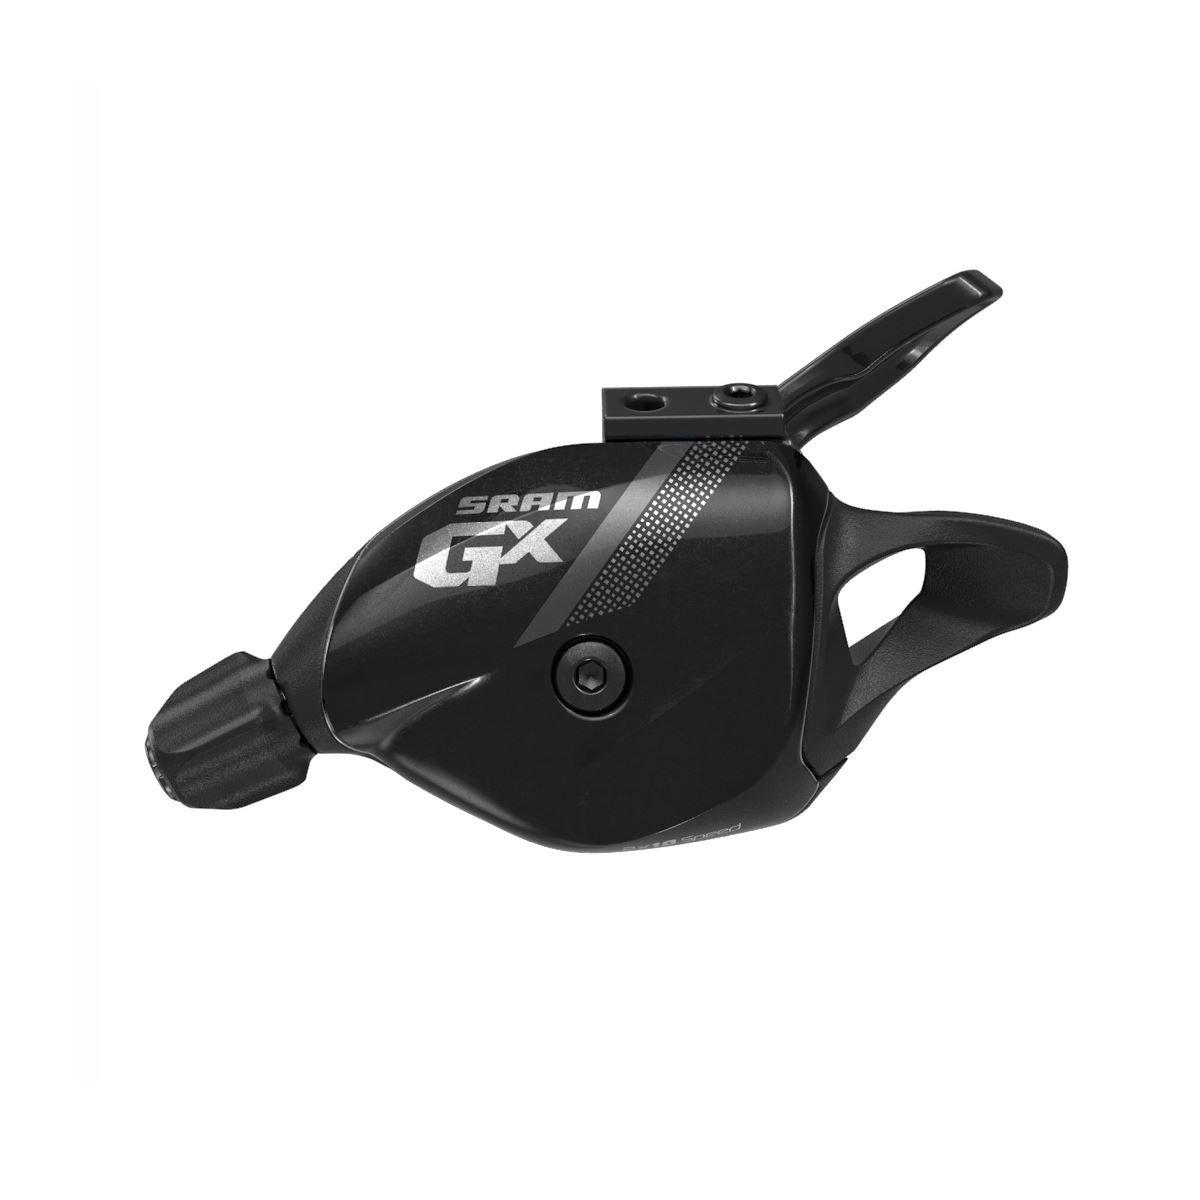 Sram Shifter Gx Trigger 10 Speed Rear W Discrete Clamp Black: Black 10 Speed